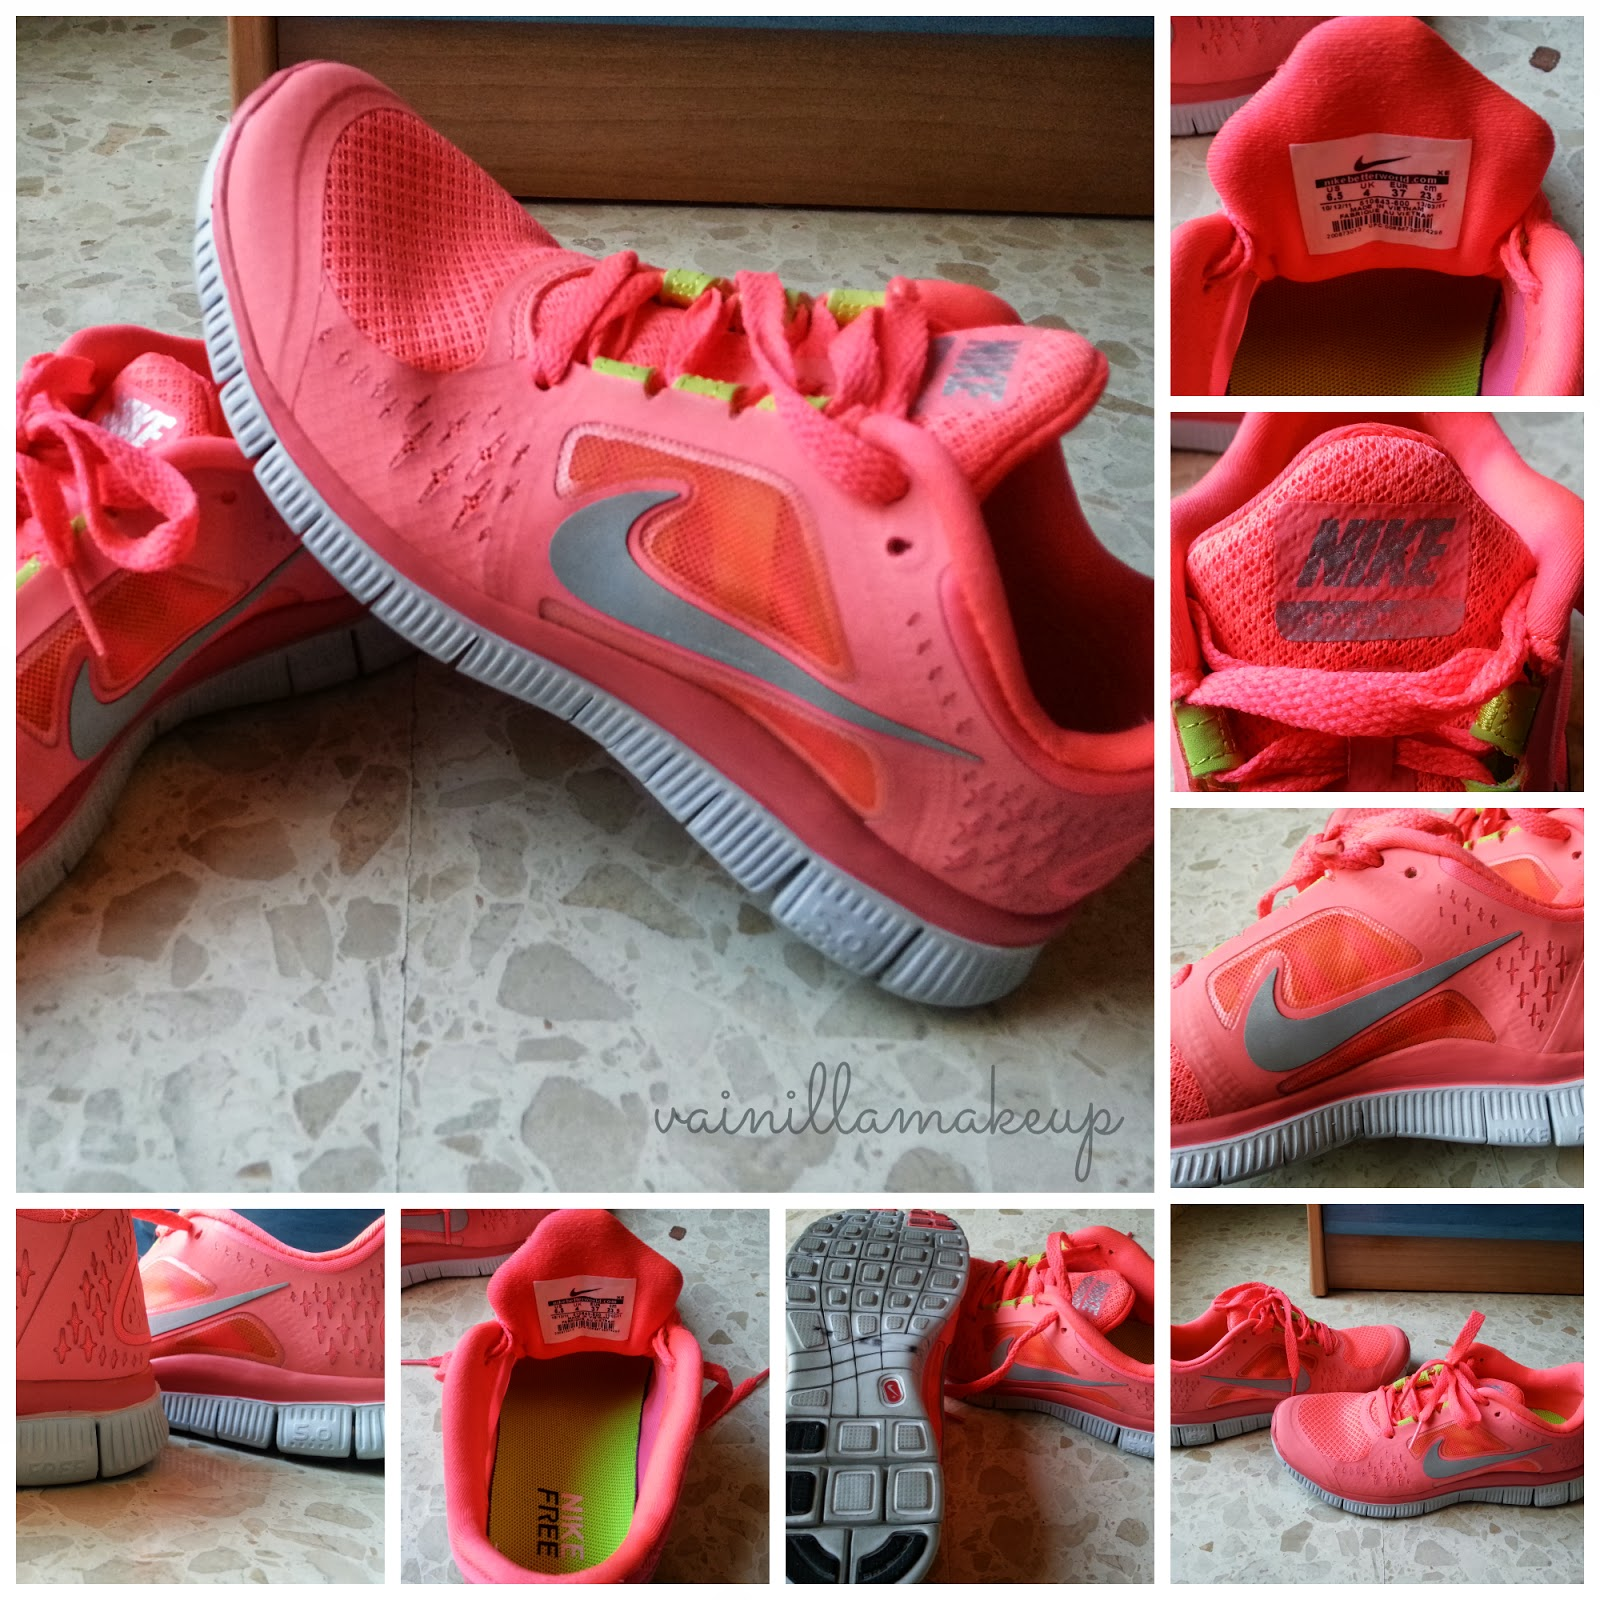 Nike Free Run - Rosa/Coral (Zapatillas fake Aliexpress)